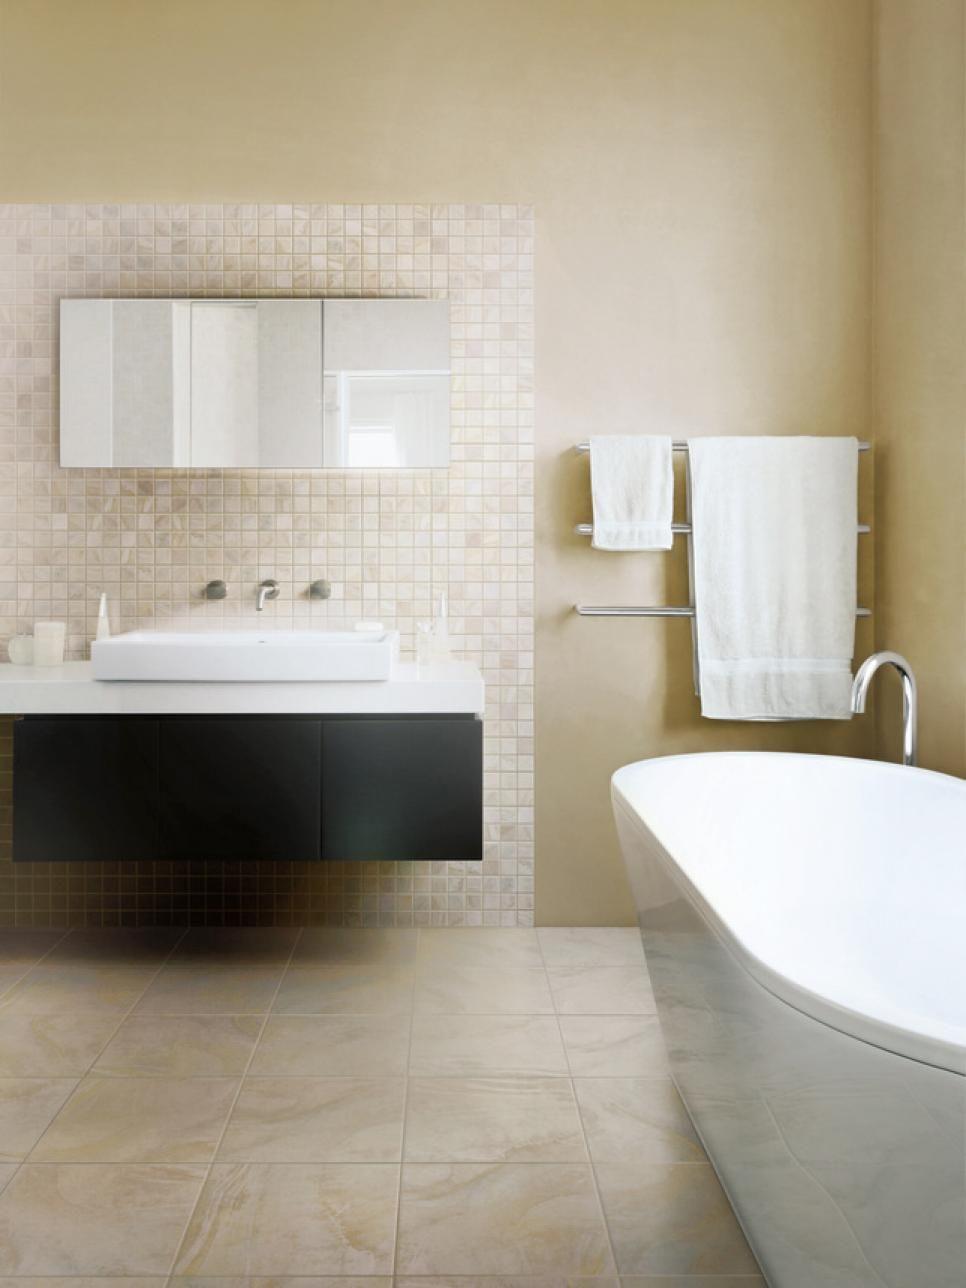 Bathroom Flooring Styles and Trends | Porcelain tile, Bathroom ...